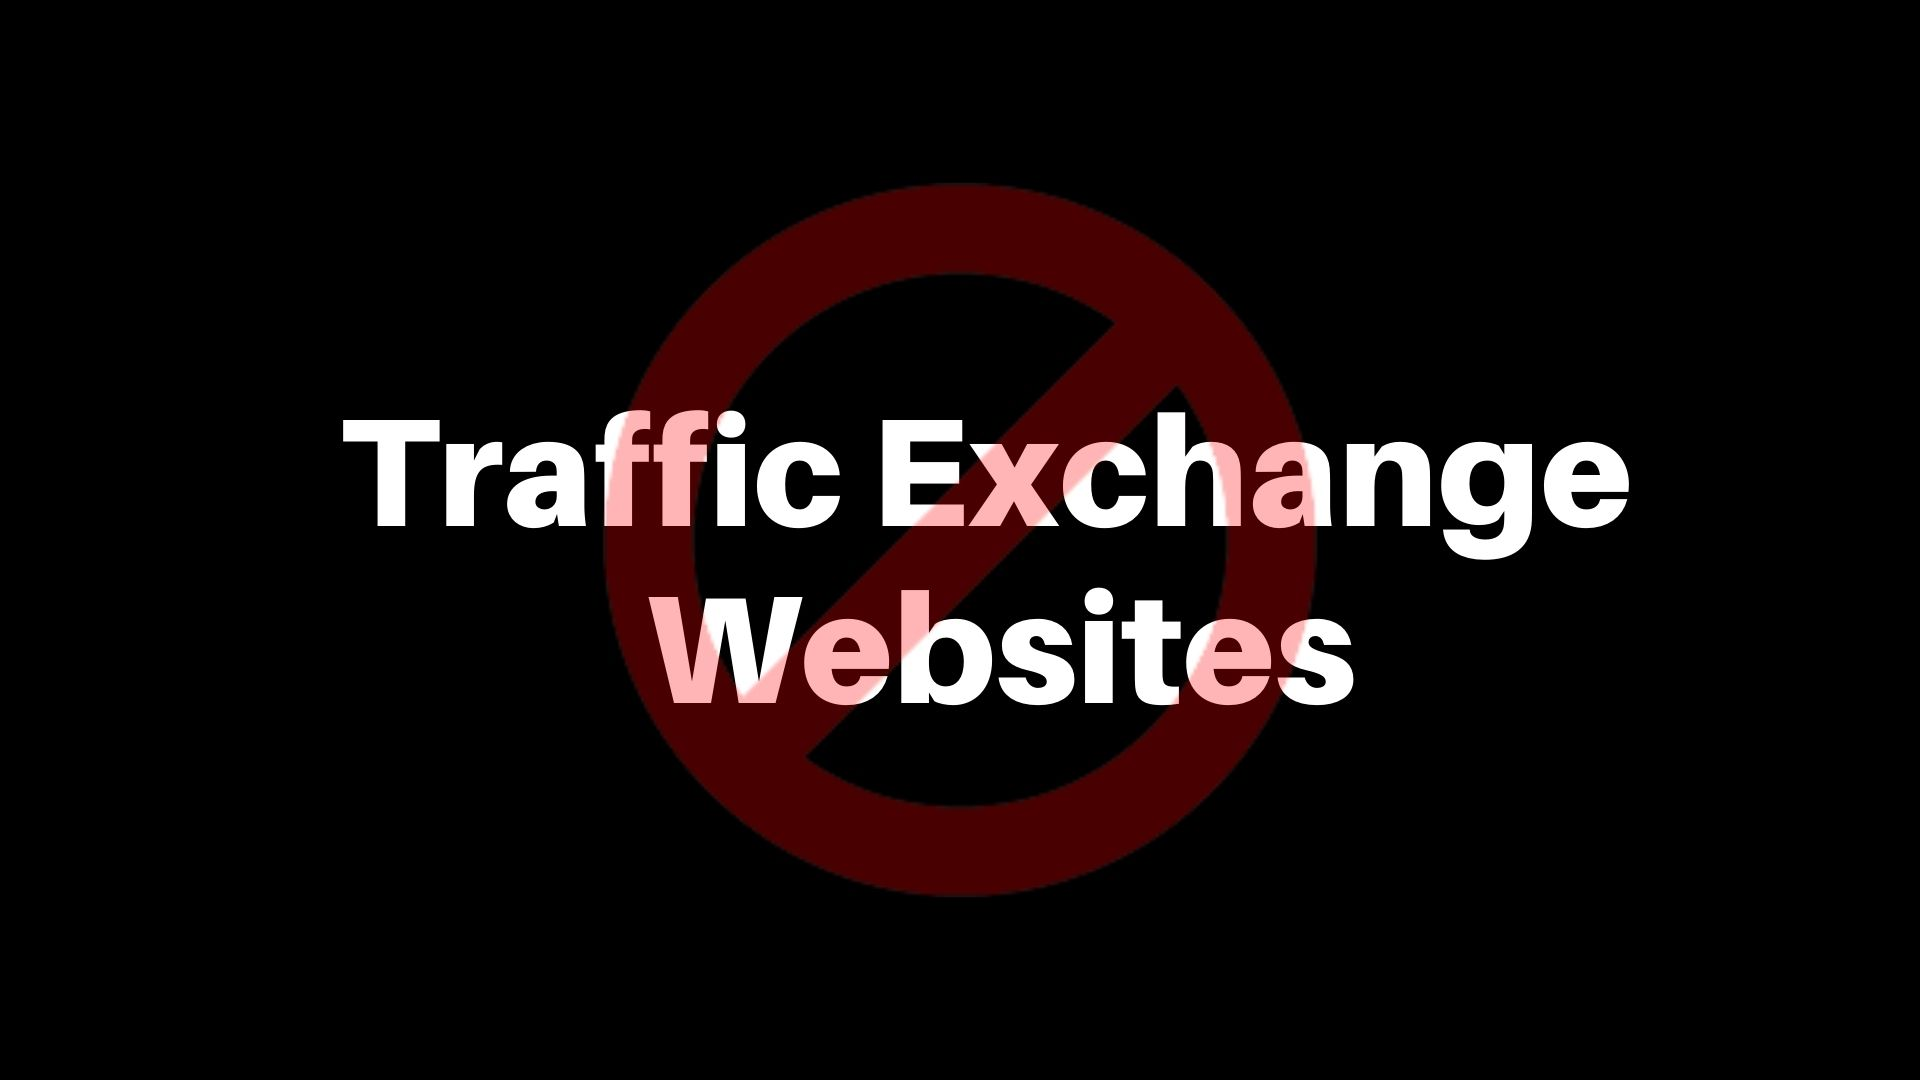 Traffic Exchange services